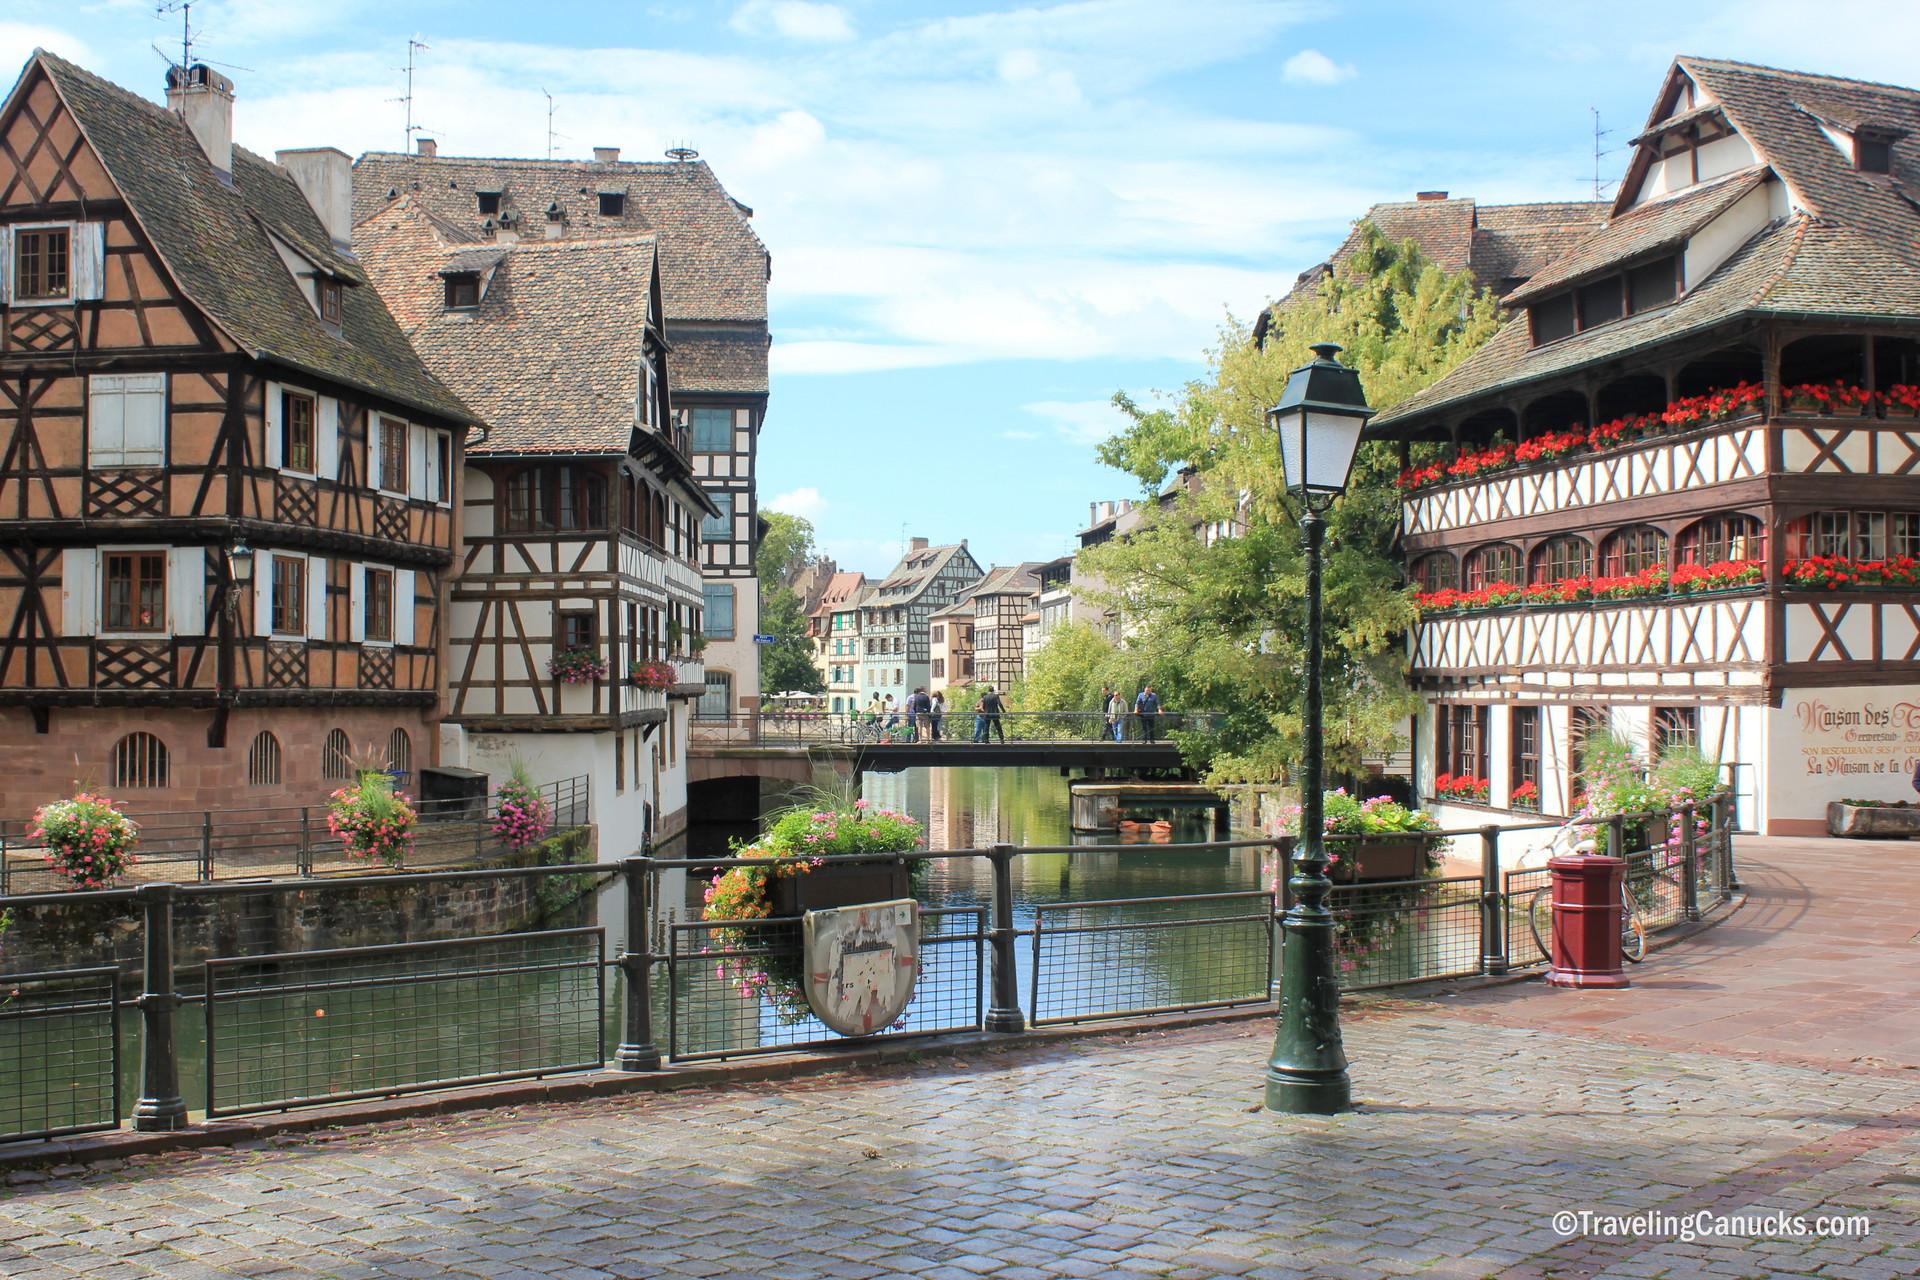 Esperienza a Strasburgo, Francia - Sara